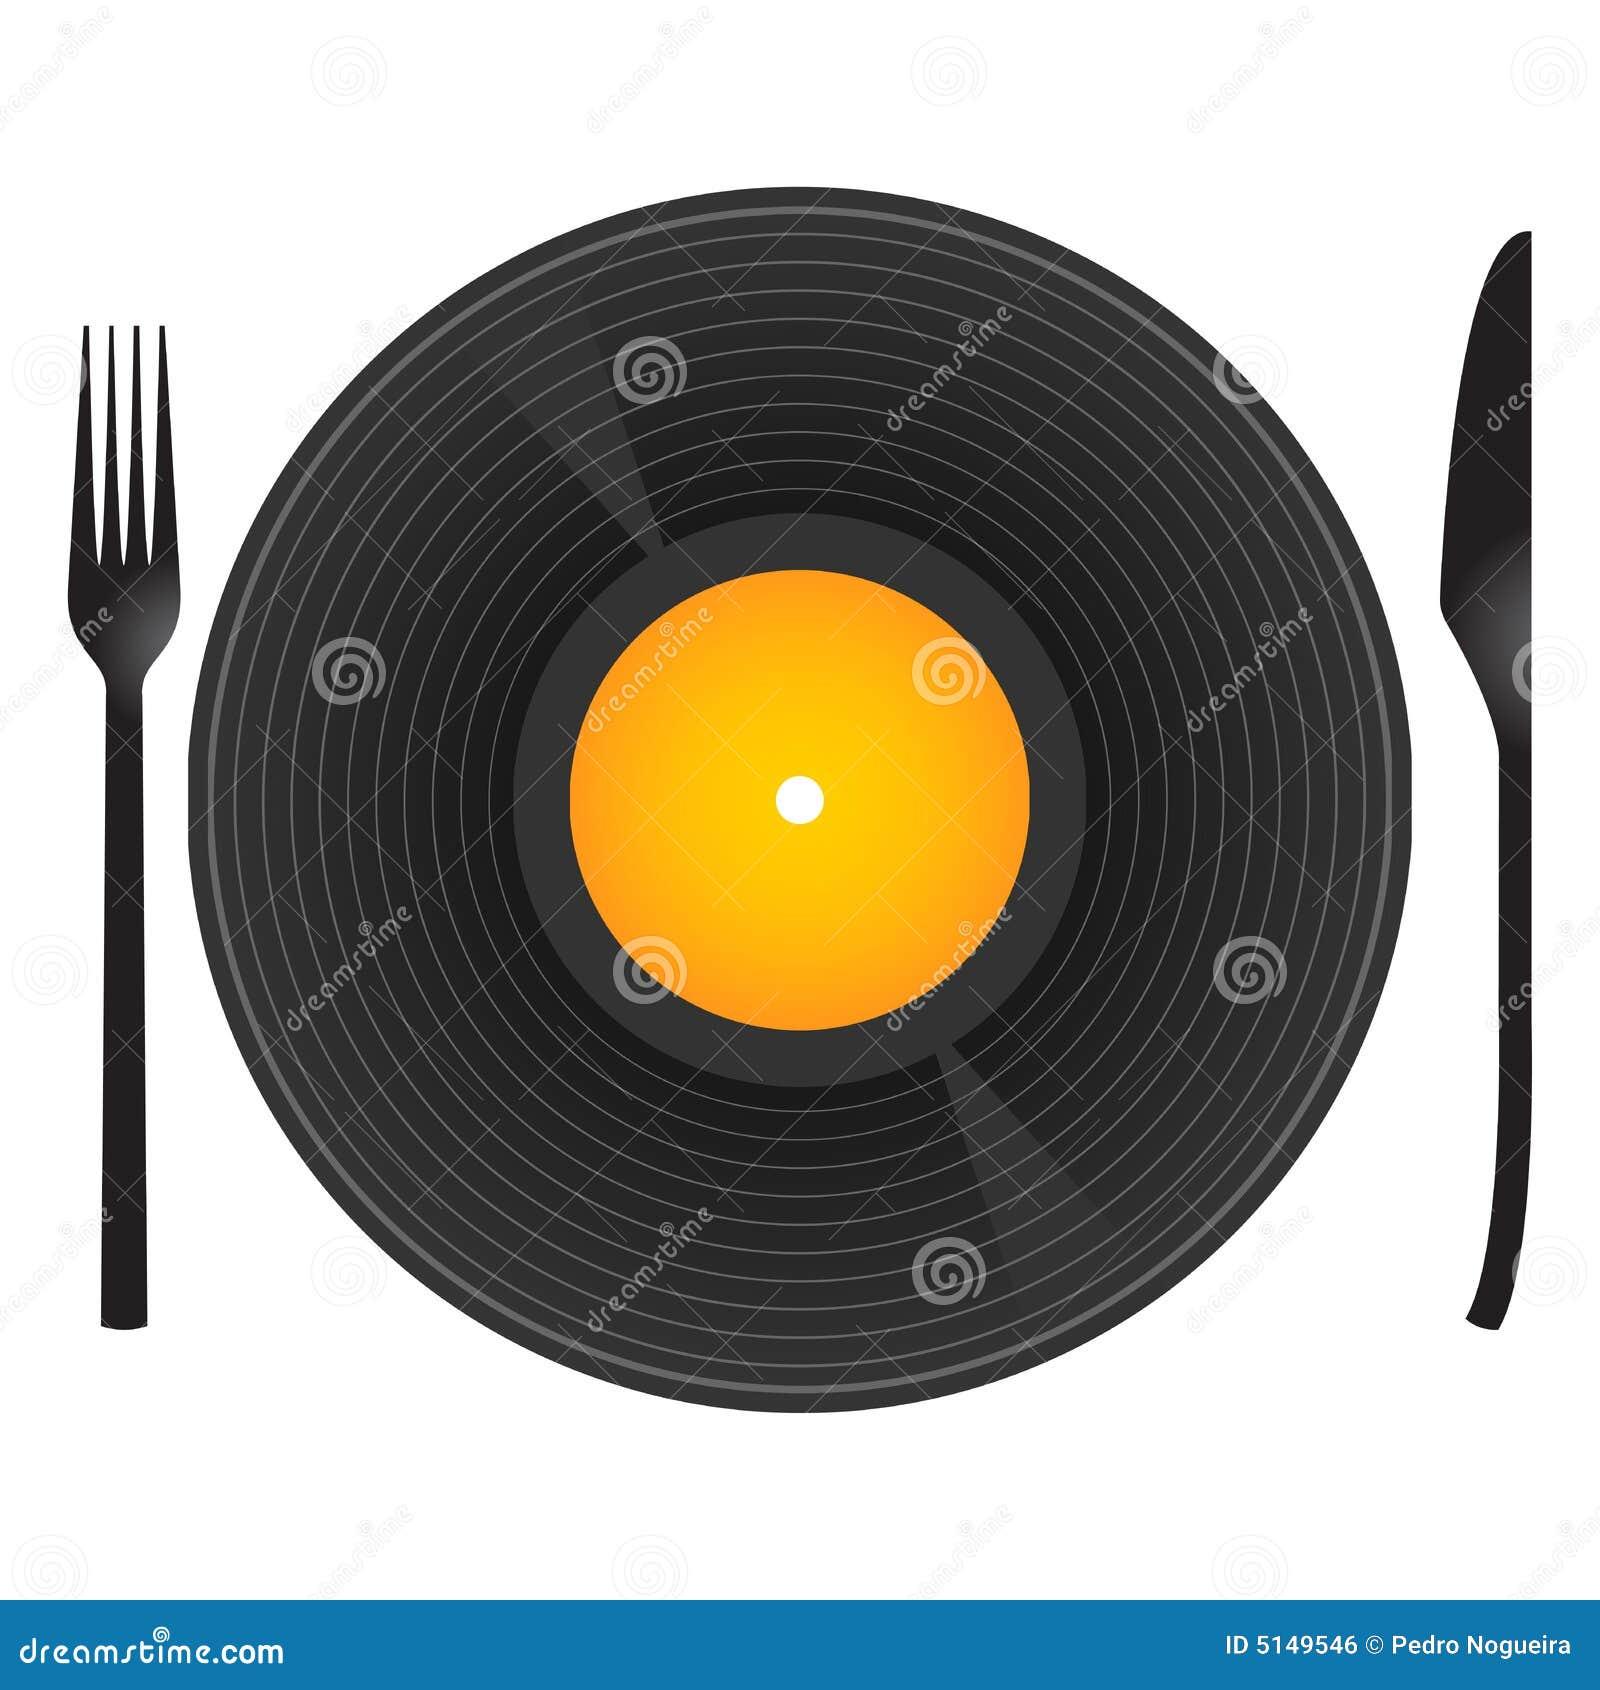 Eat my music